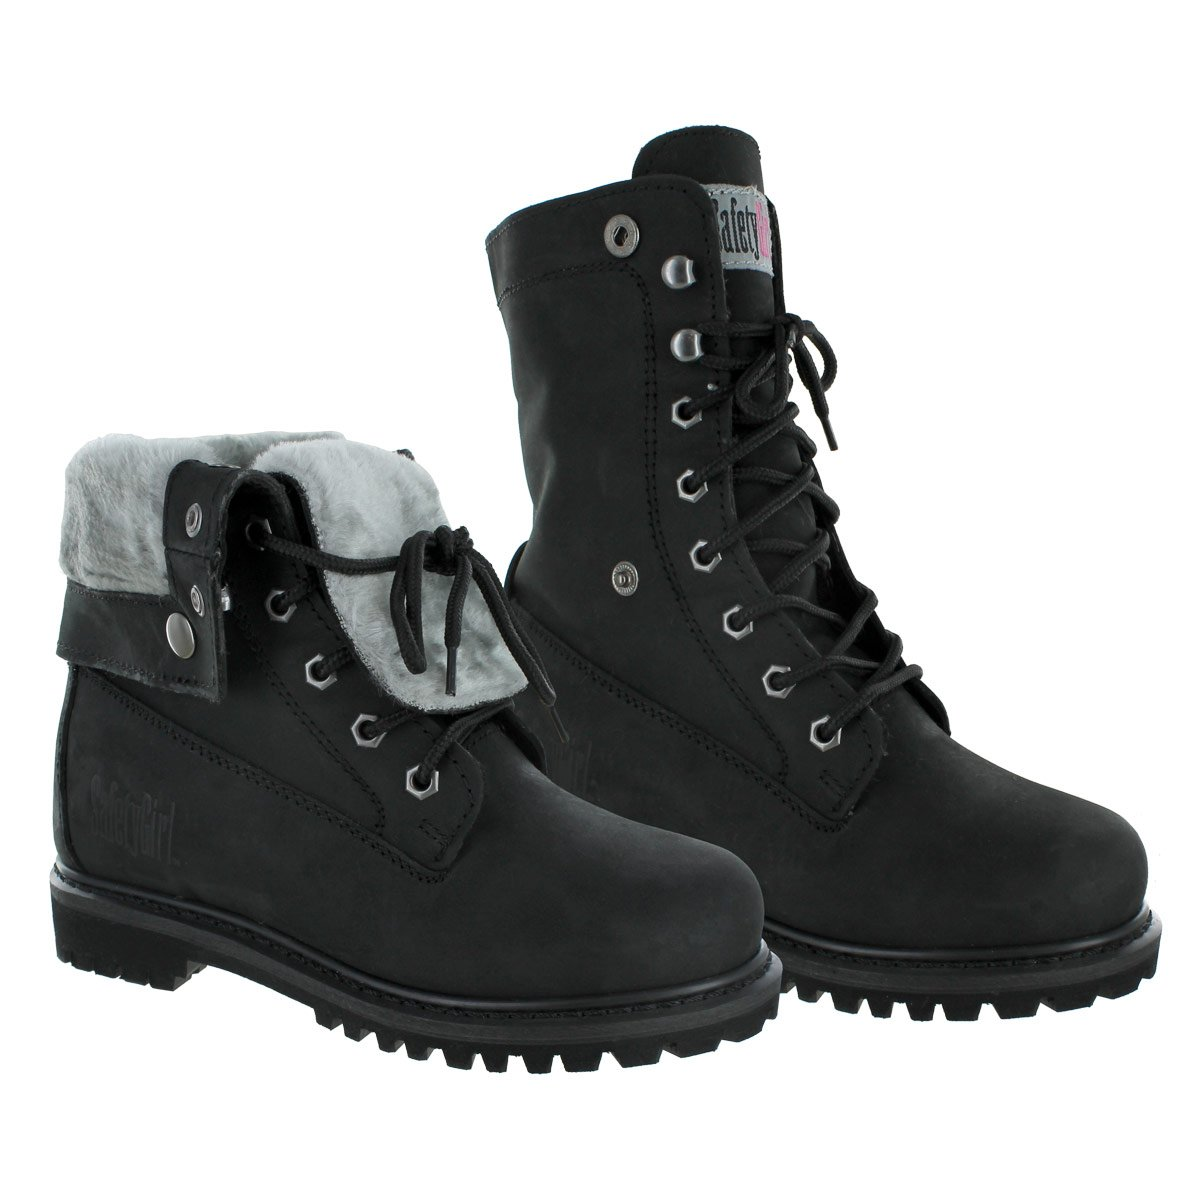 Safety Girl Madison Fold-Down Work Boot B01NAYNK7M 8M Black